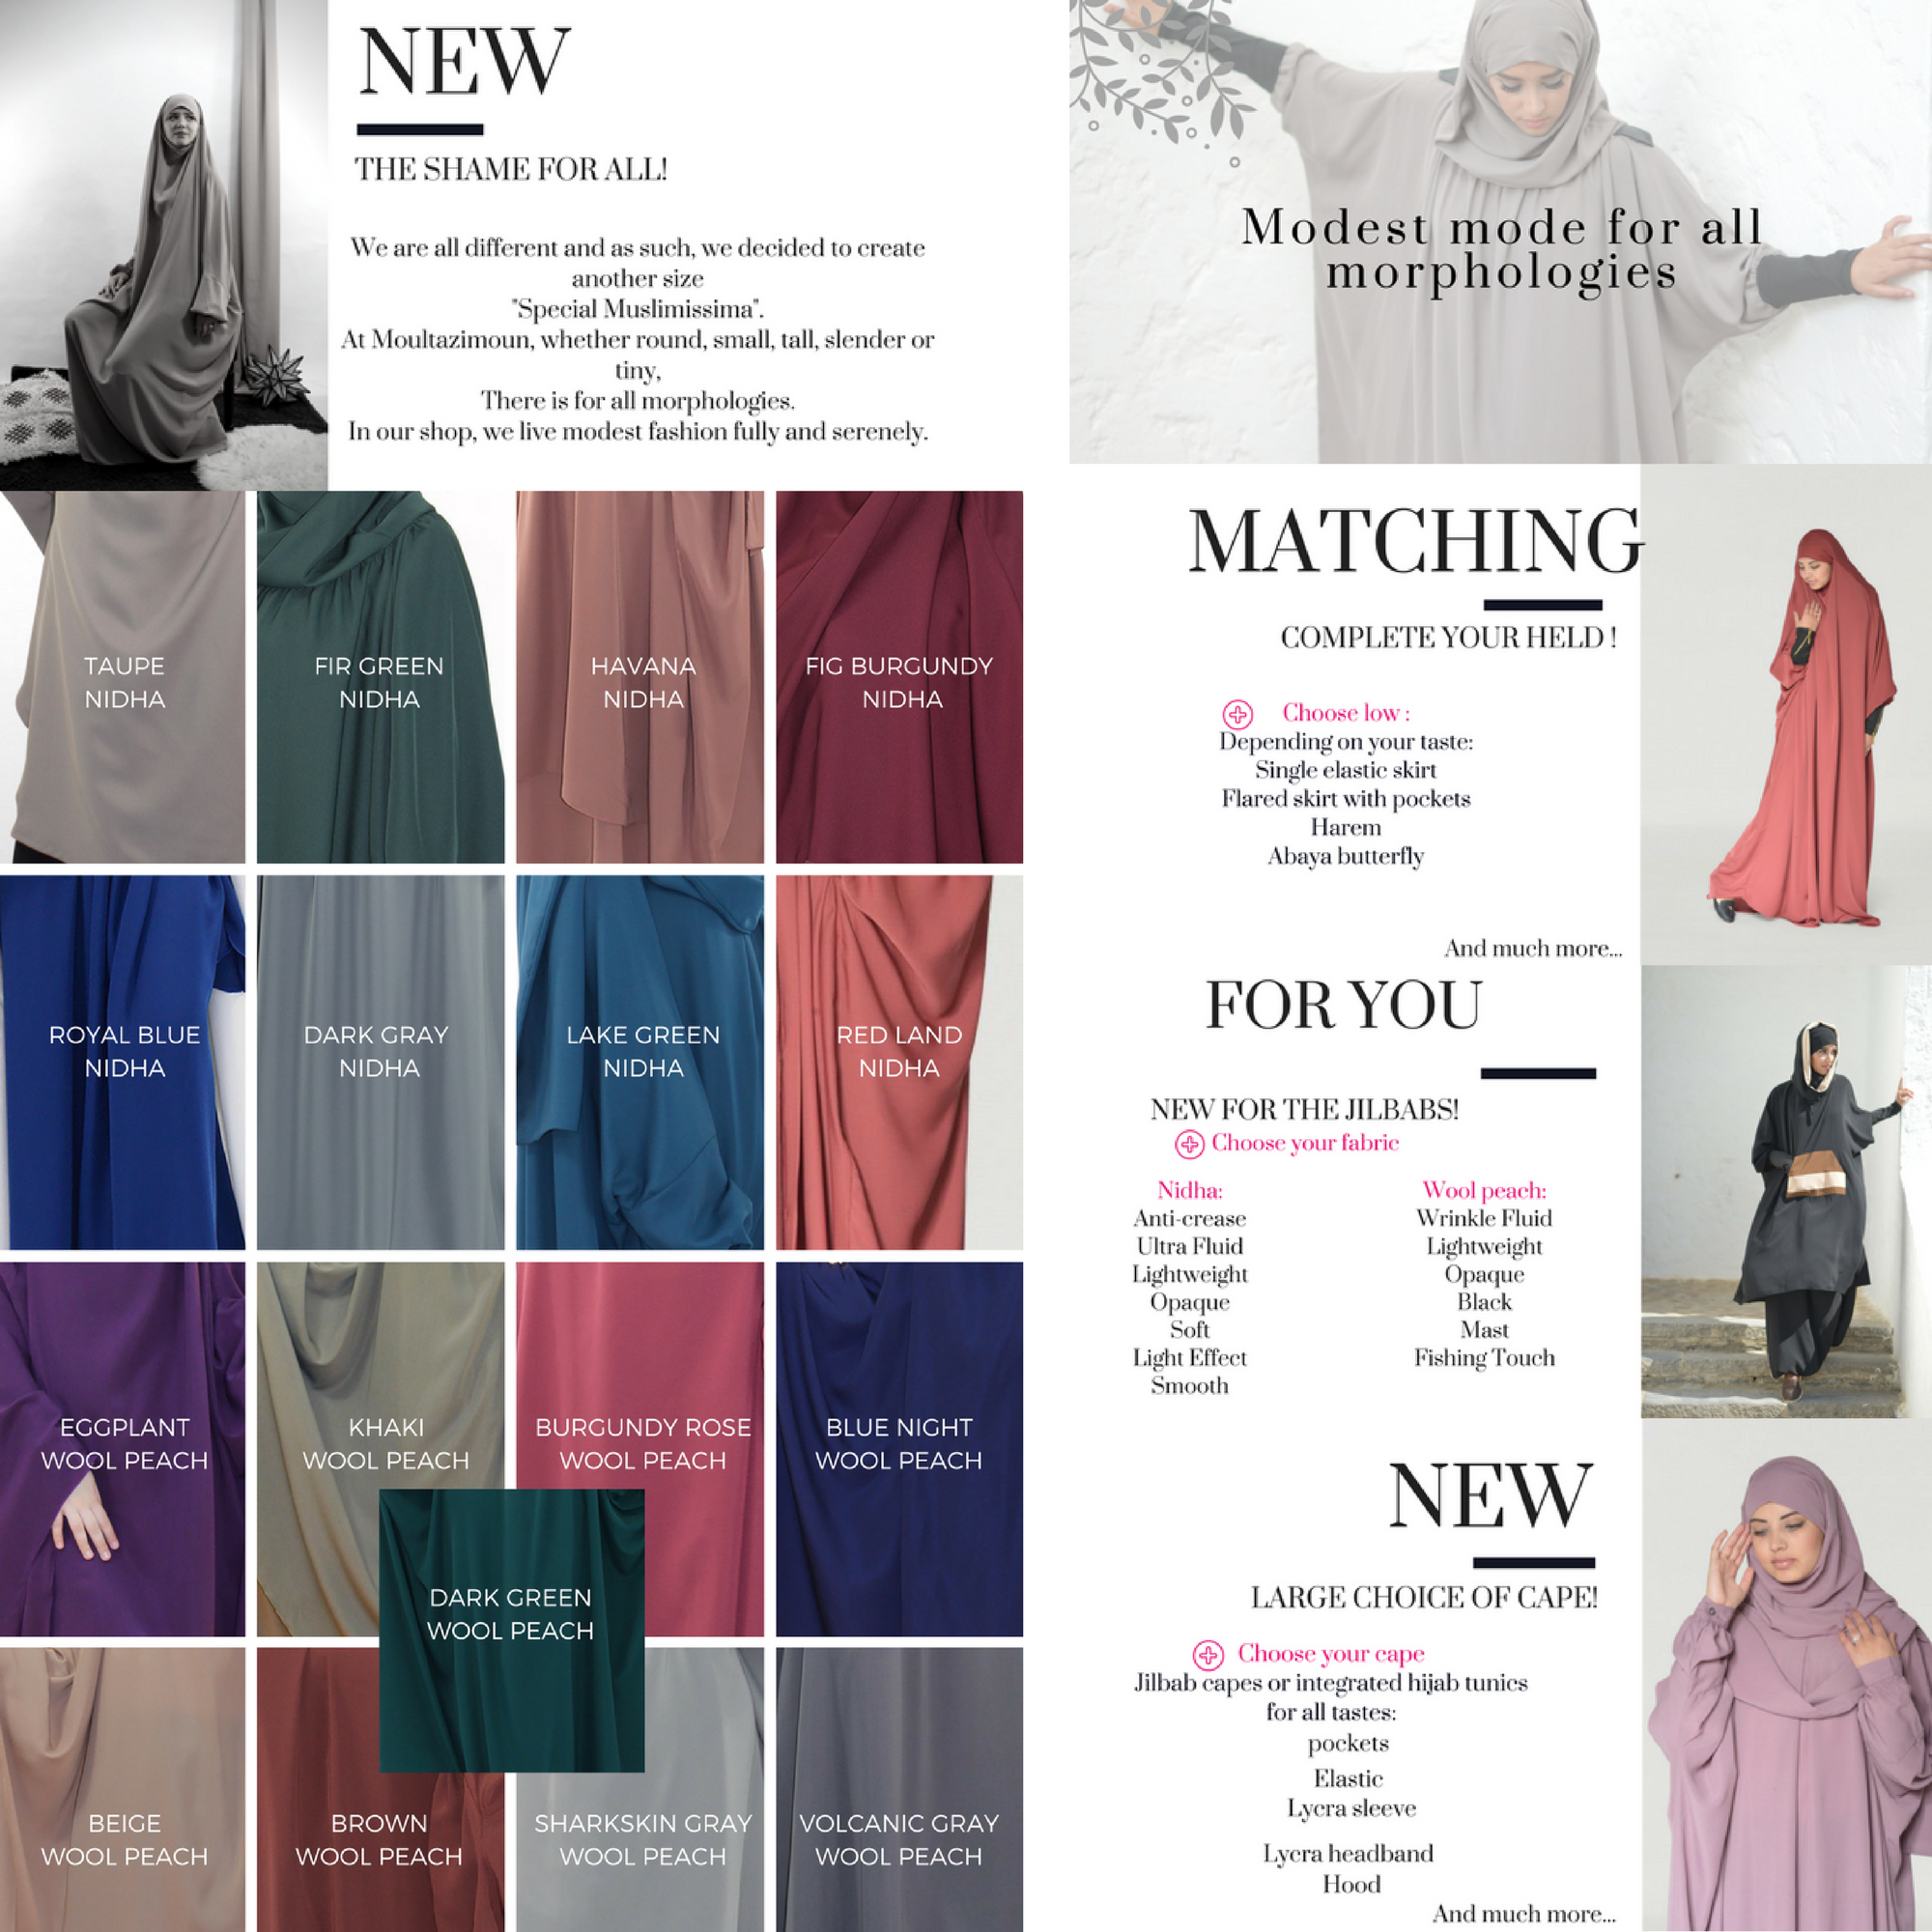 29e0a7800fb Tunic with Integrated Hijab - Al Moultazimoun Boutique